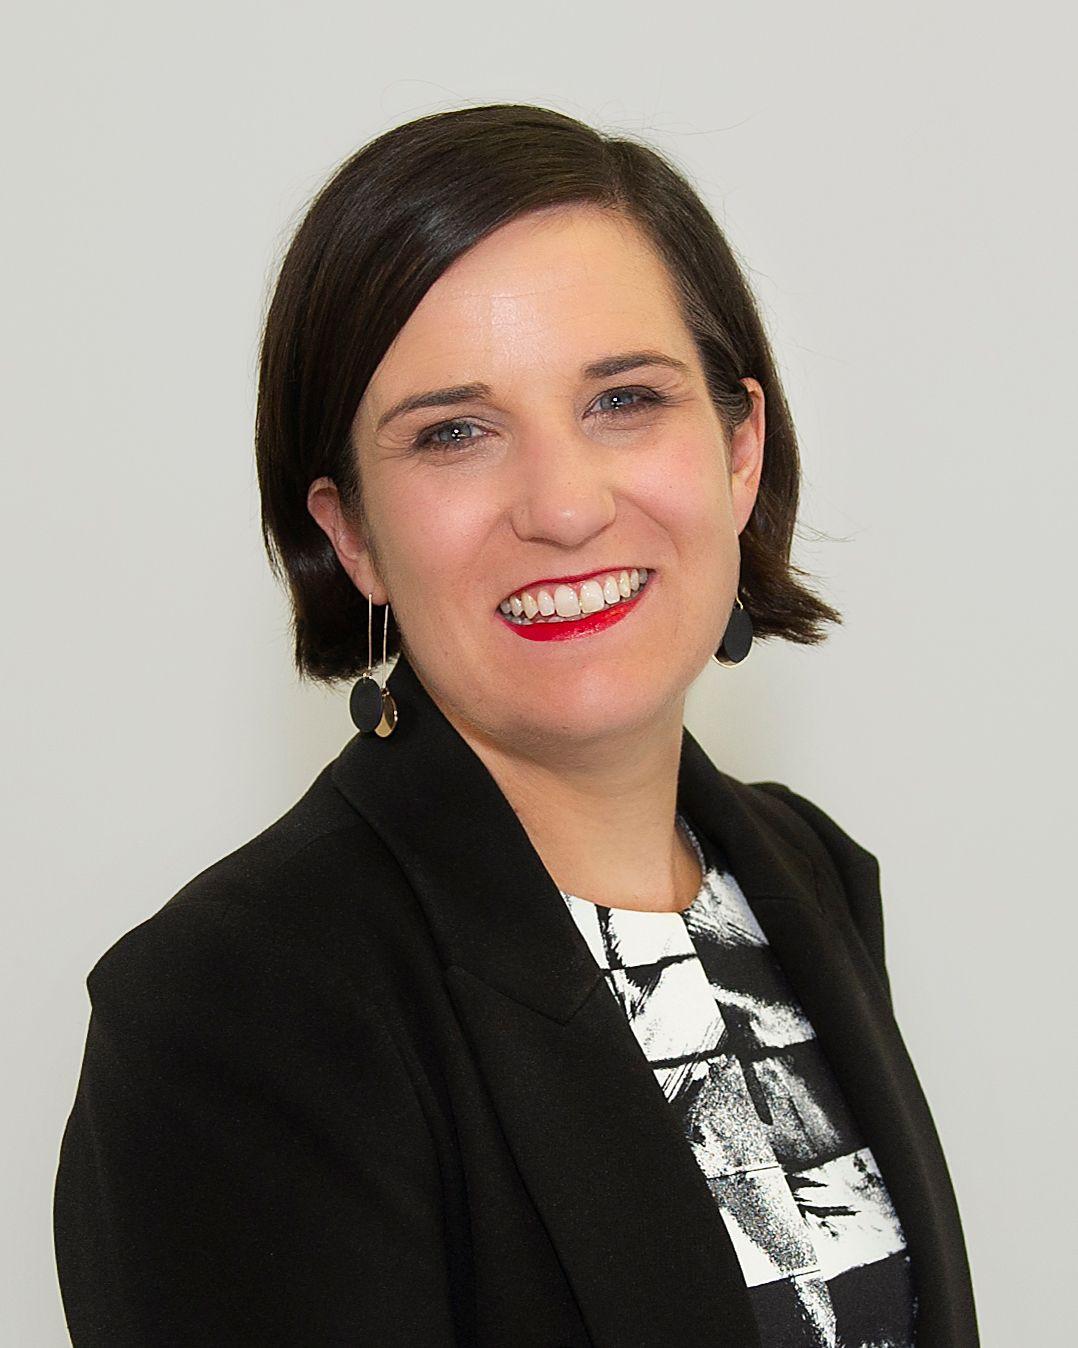 Rachael Rotherham